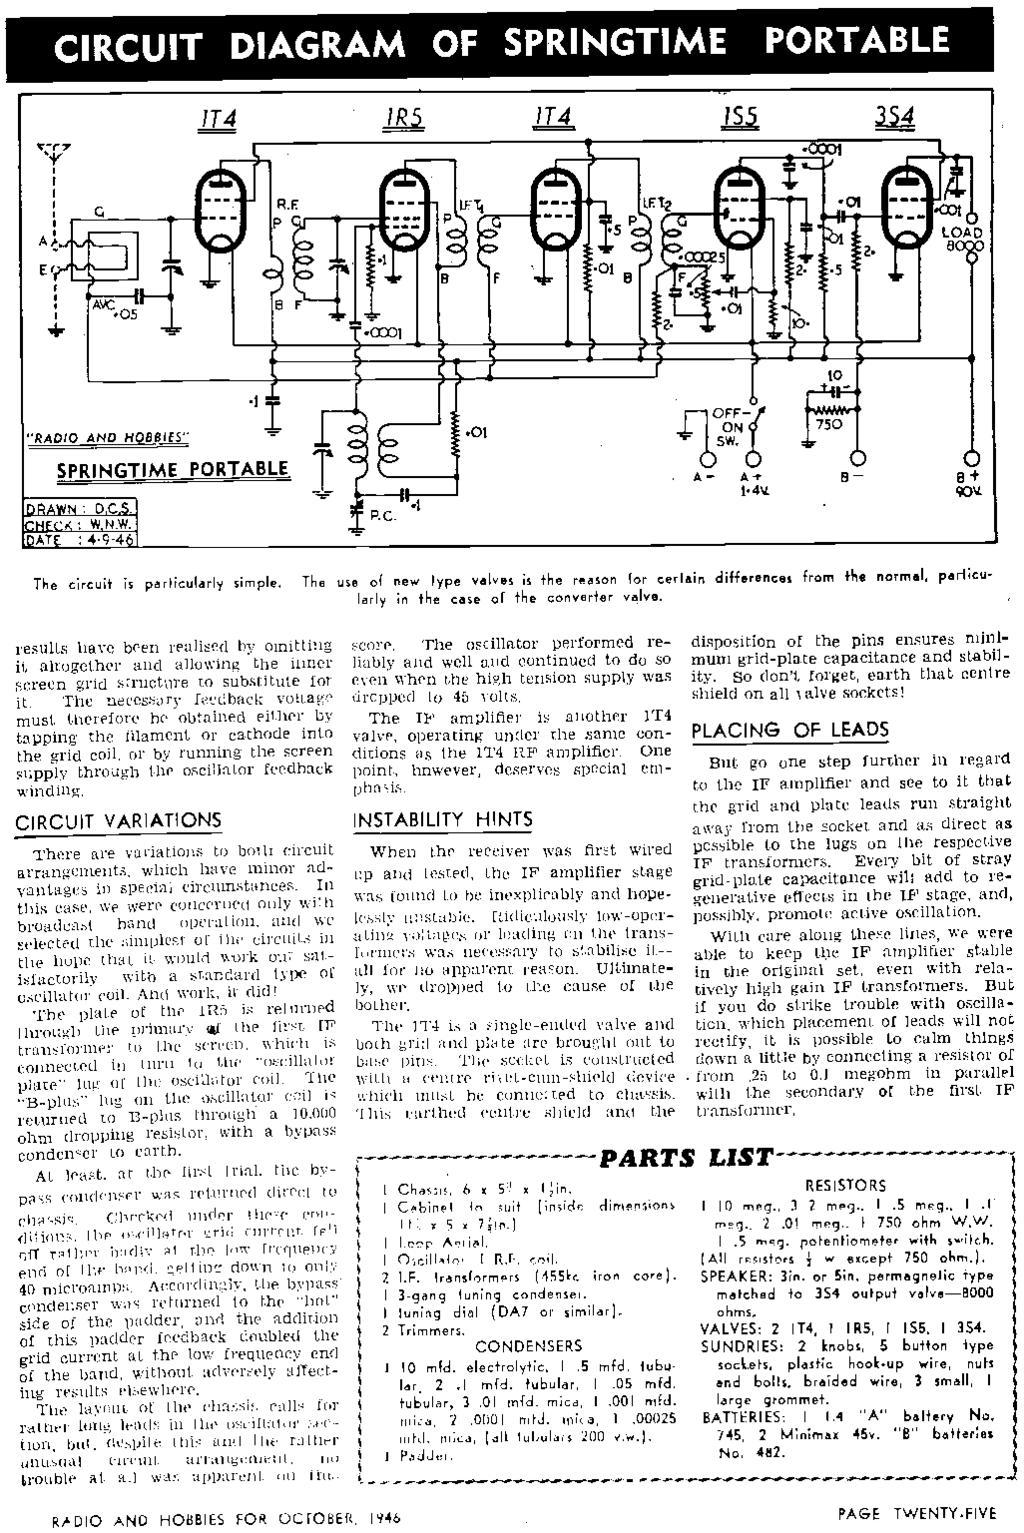 hight resolution of lw i 05 i ii i 14 circuit diagram of springtime portable 174 174 la s